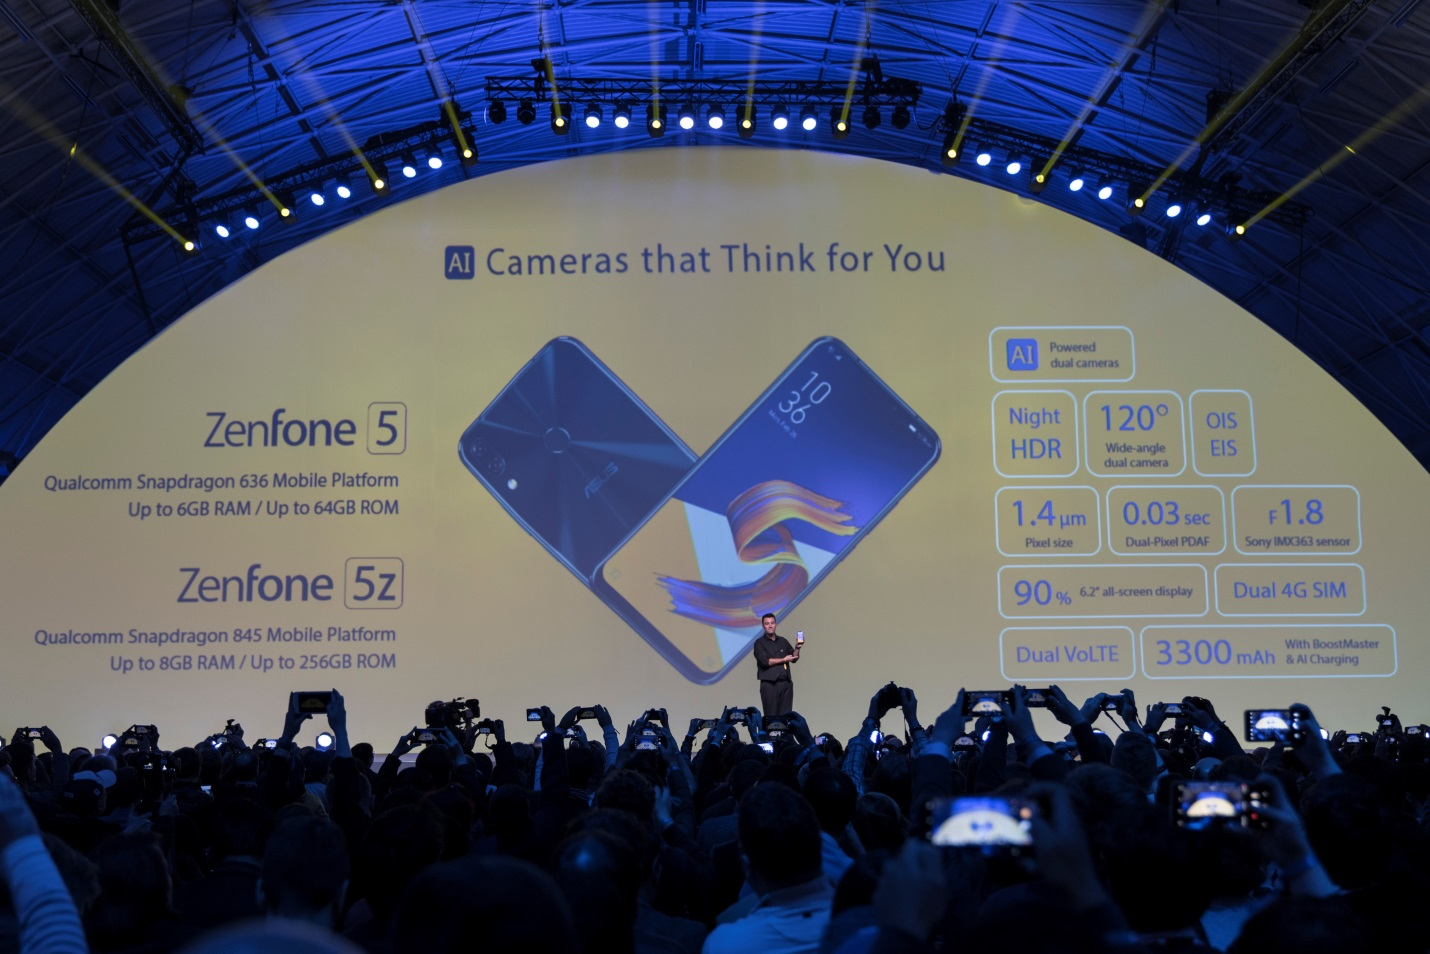 ASUS Zenfone 5 Zenfone 5z